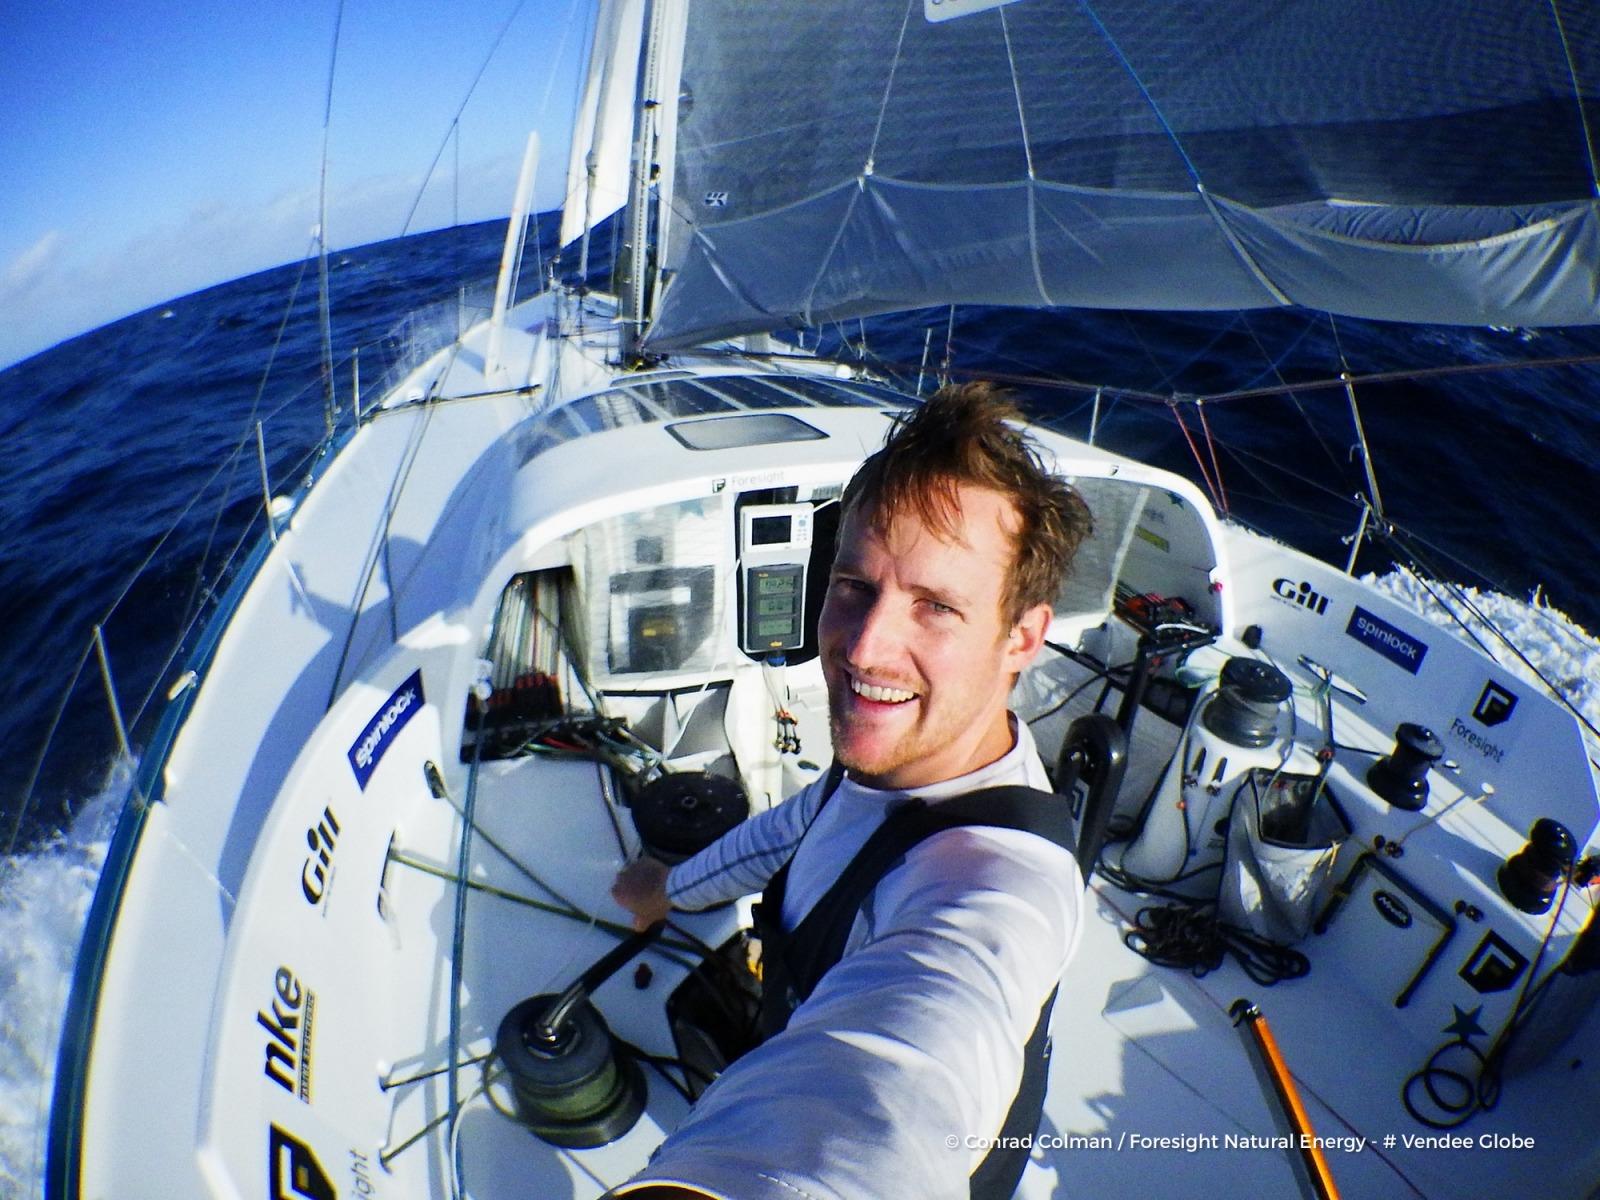 Conrad Colman démâte mais veut continuer — Vendée Globe